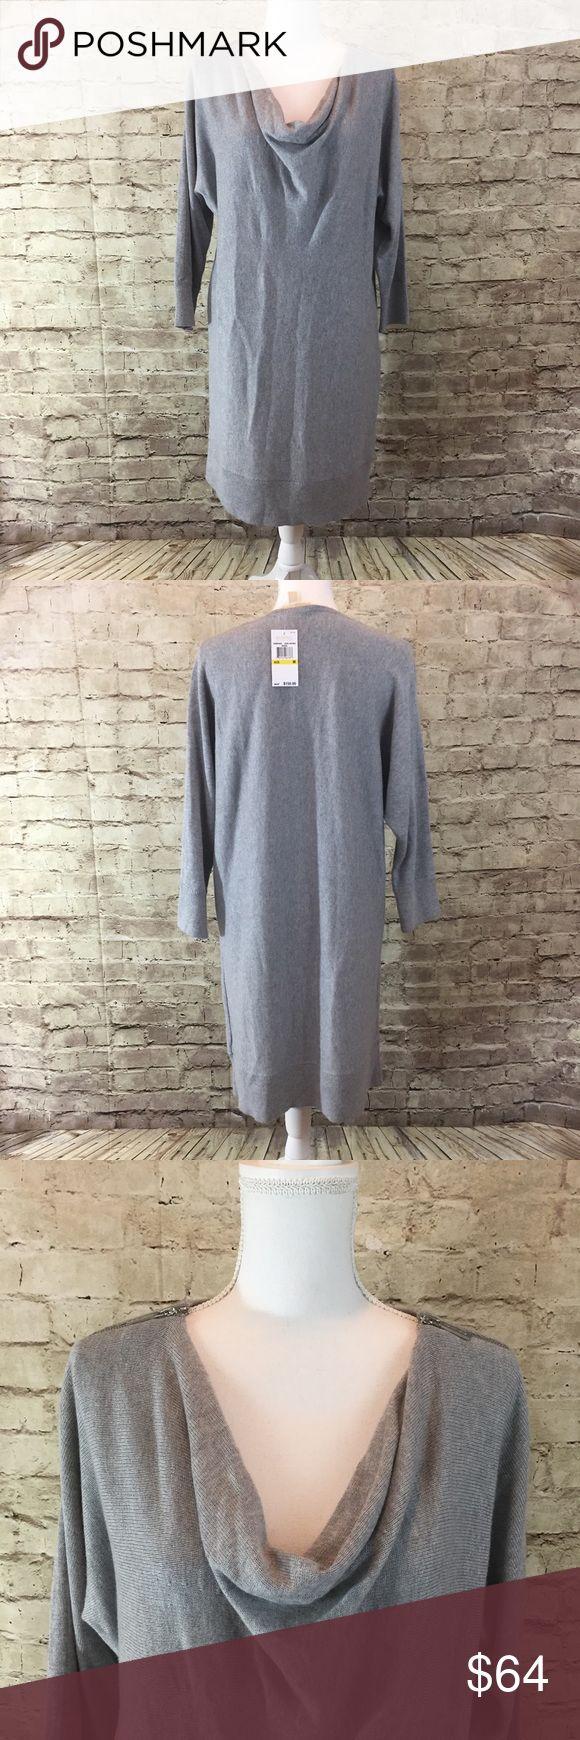 Michele Kors Cowl Neck Sweater Dress Gown neck grey sweater dress with zipper detail on the shoulder. MICHAEL Michael Kors Dresses Mini